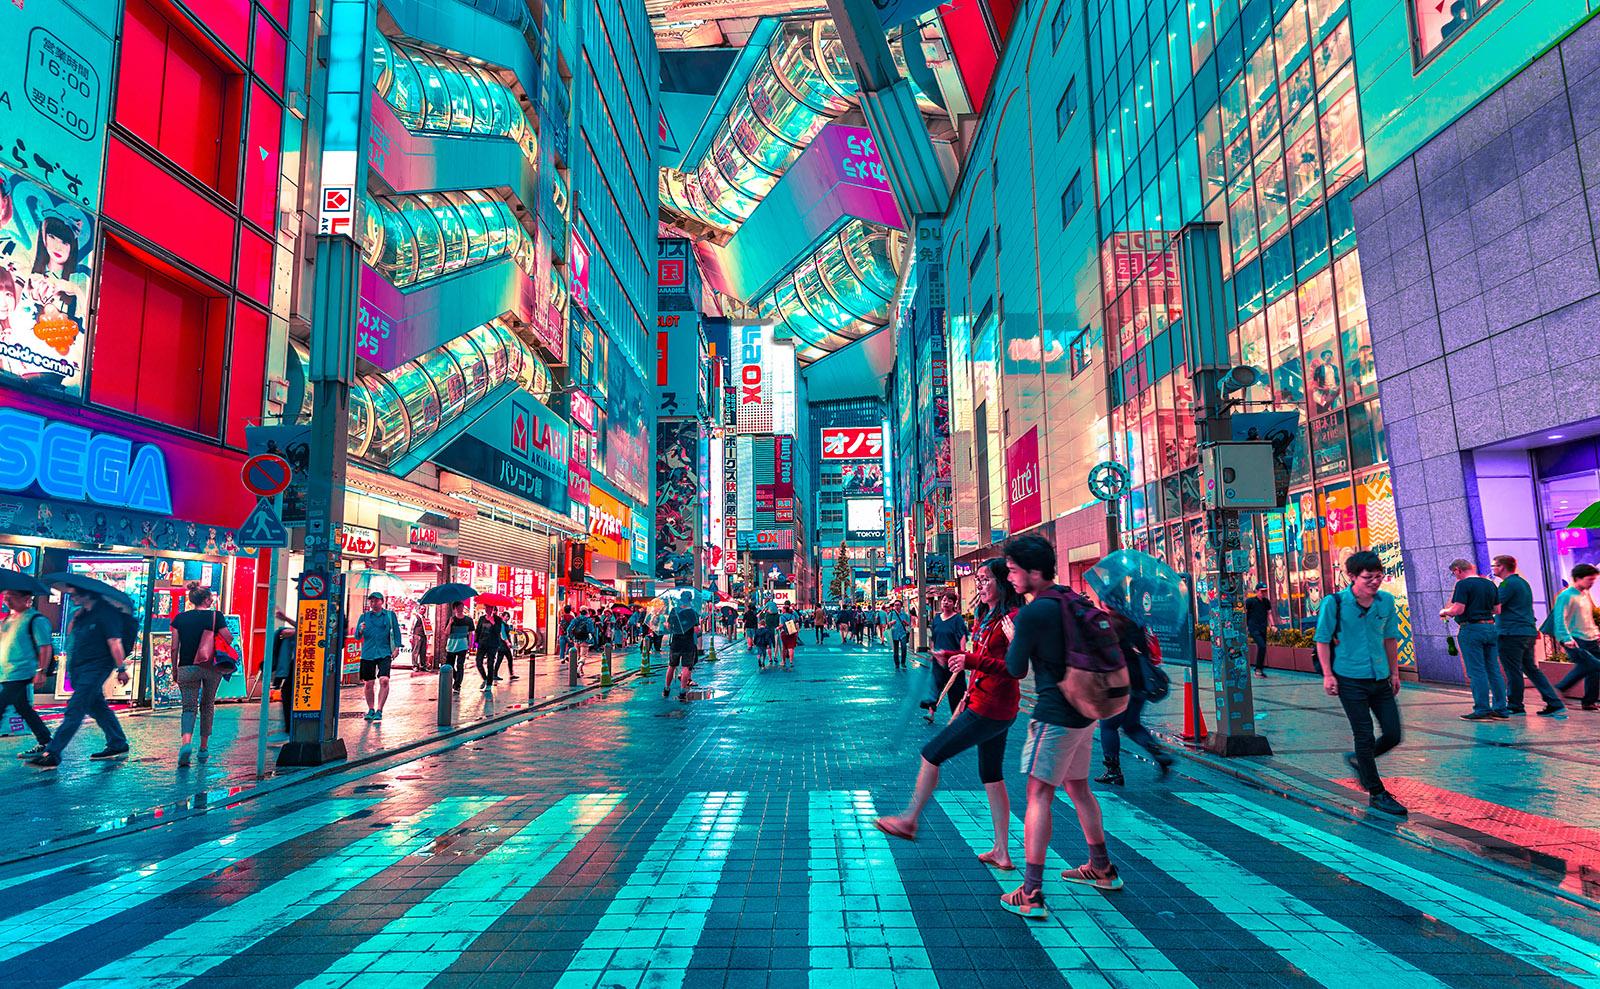 neon-lit street in tokyo.